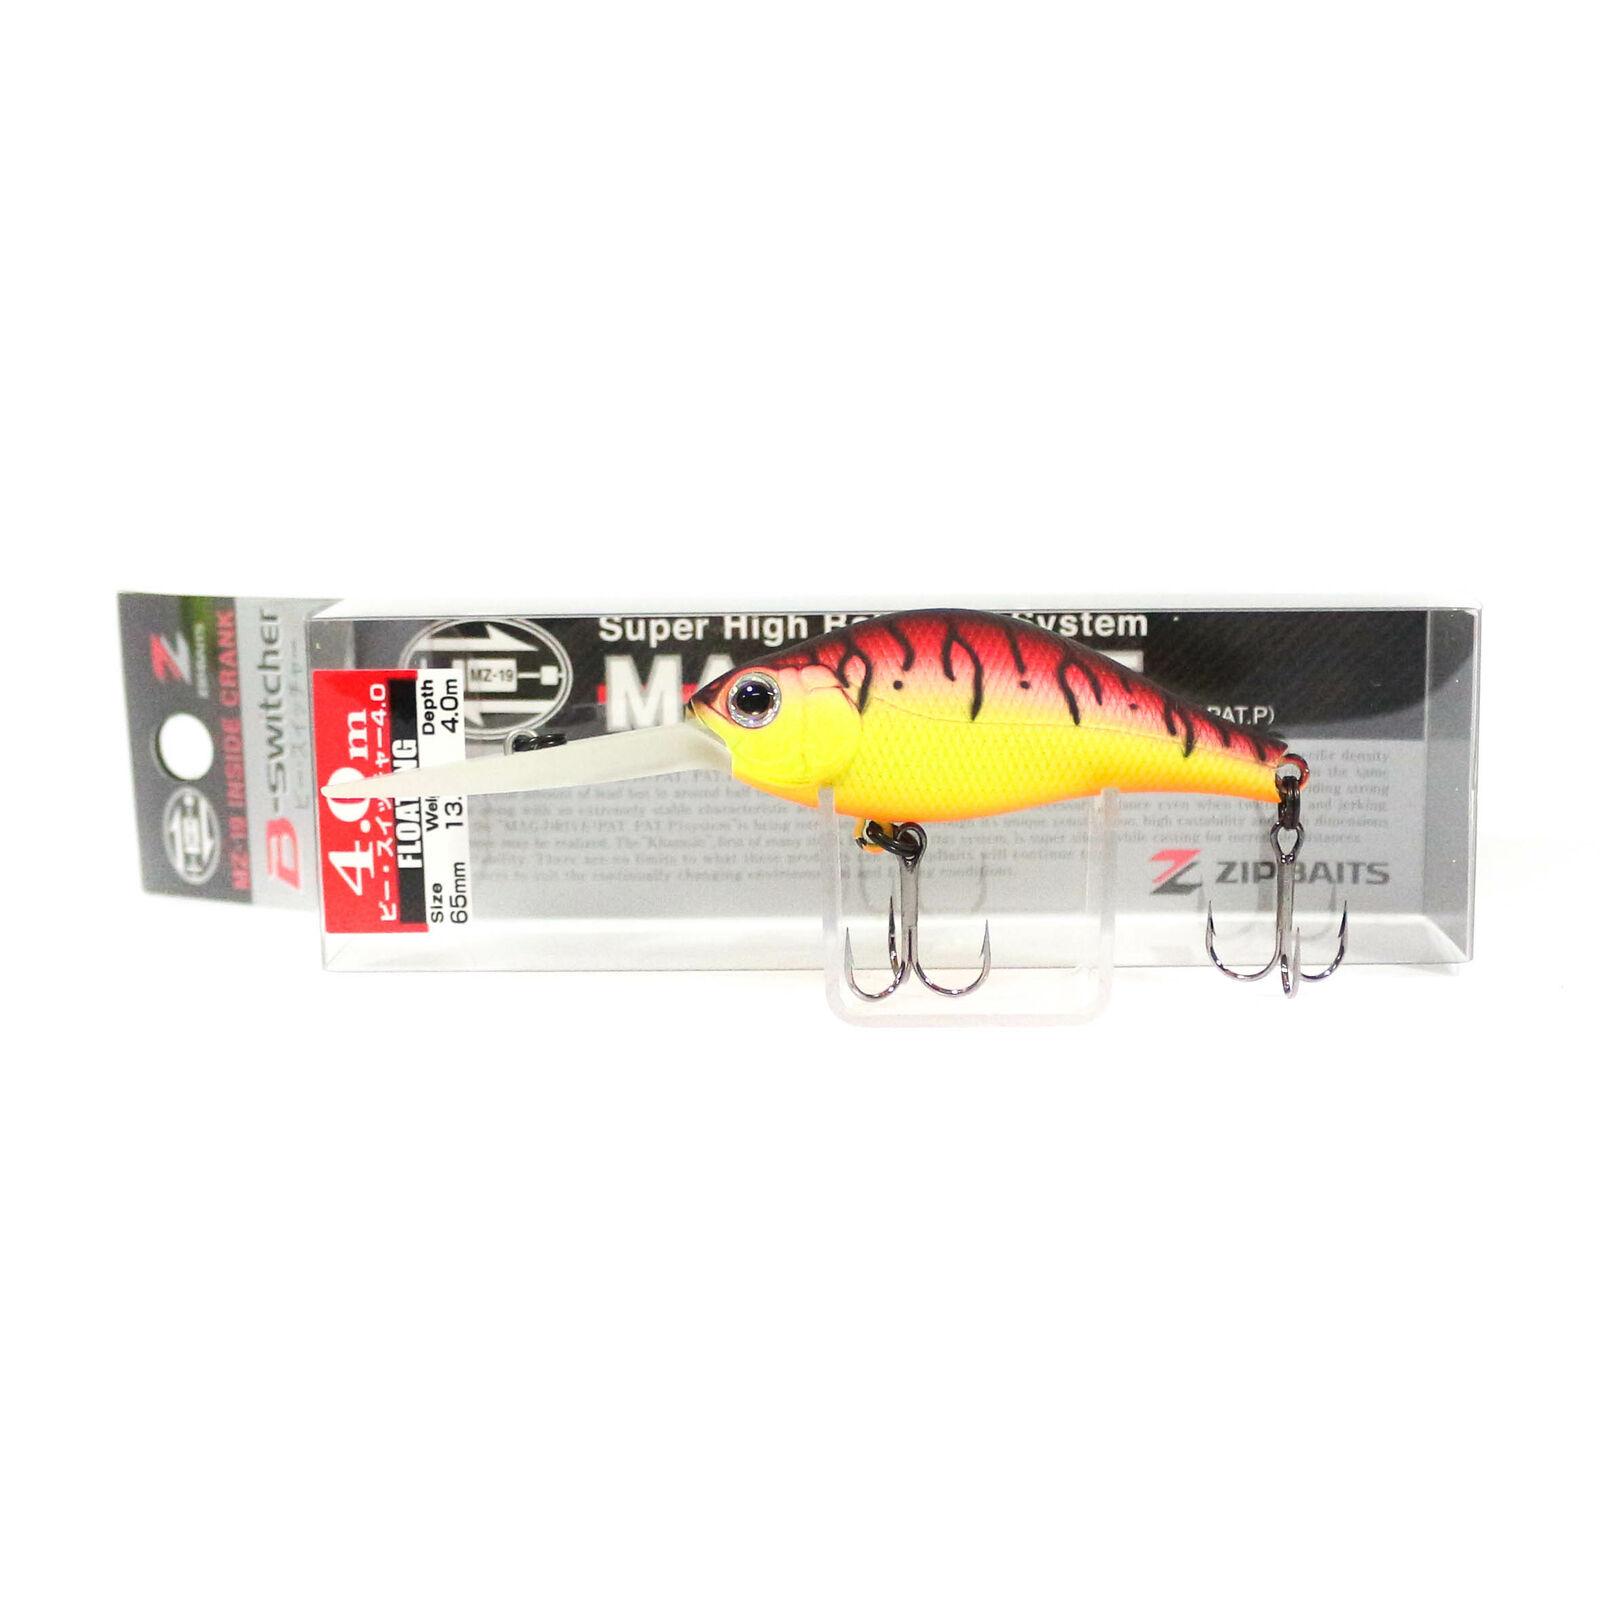 Zipbaits B Switcher 4.0 65mm Floating Lure 673 3496